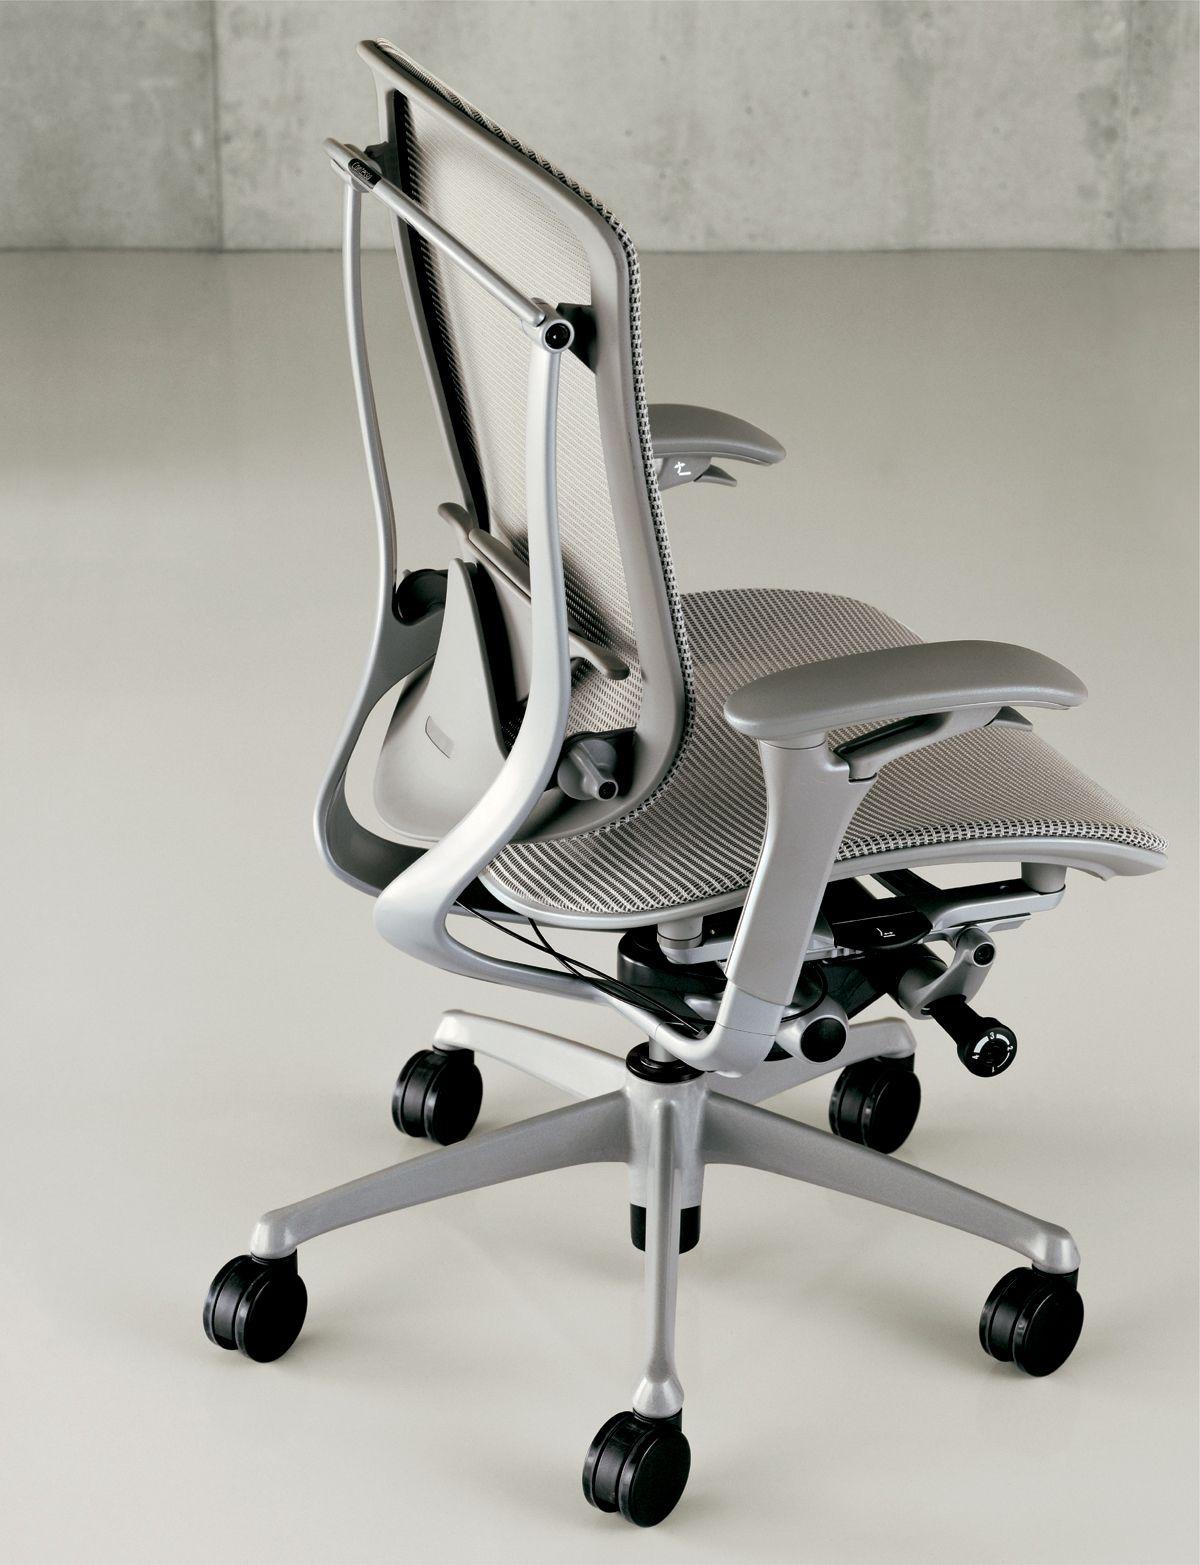 Contessa in 2019 Ergonomic office chair, Chair price